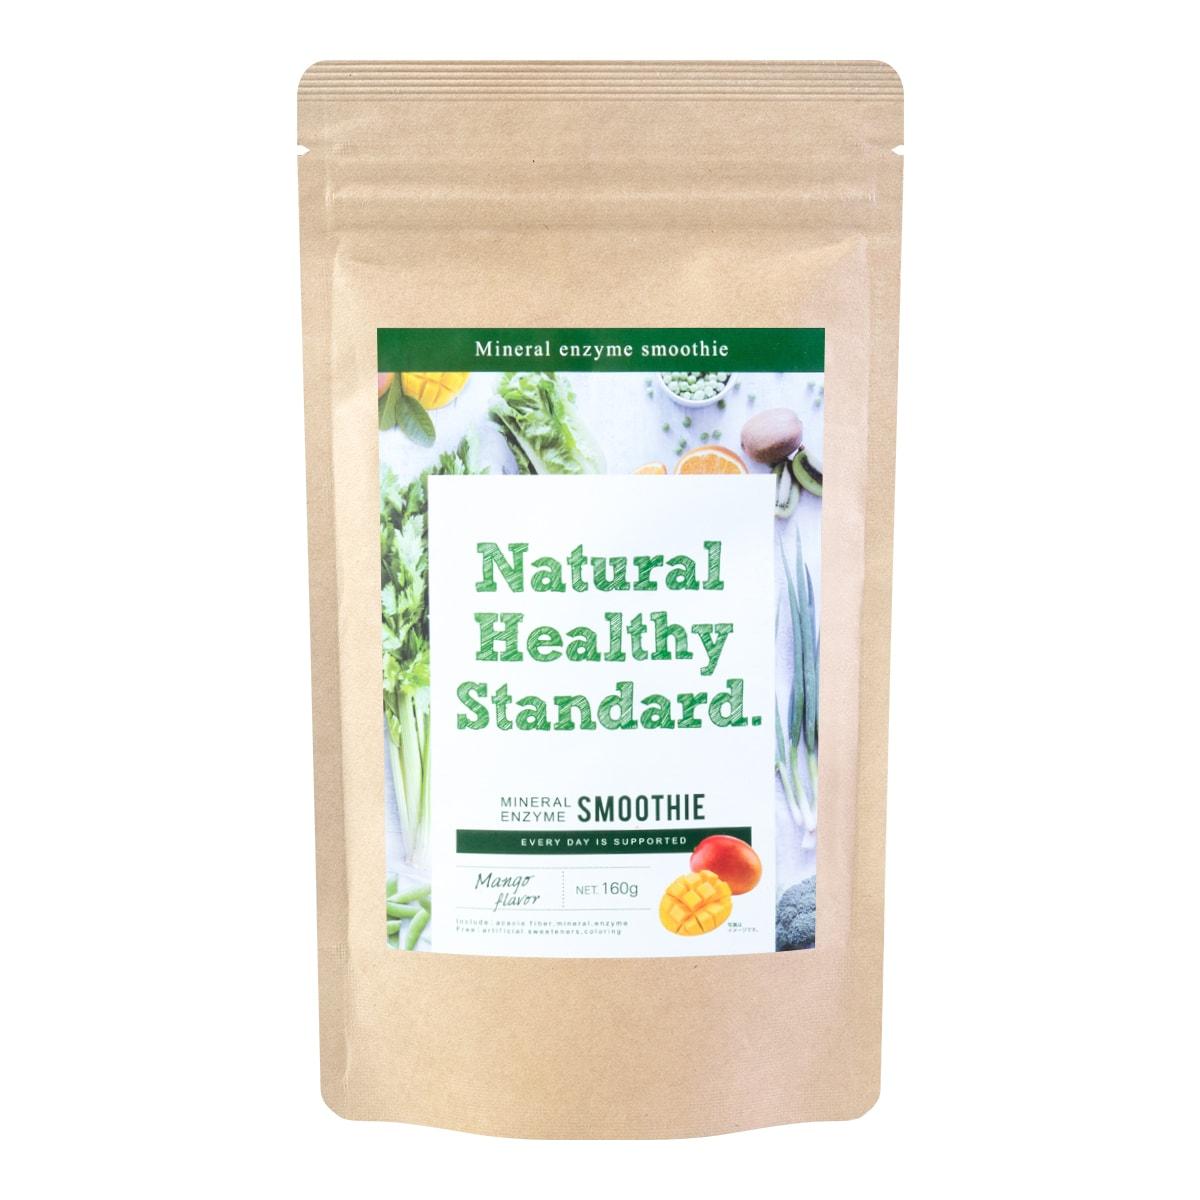 Mineral Enzyme Smoothie Powder Mango Flavor 160g